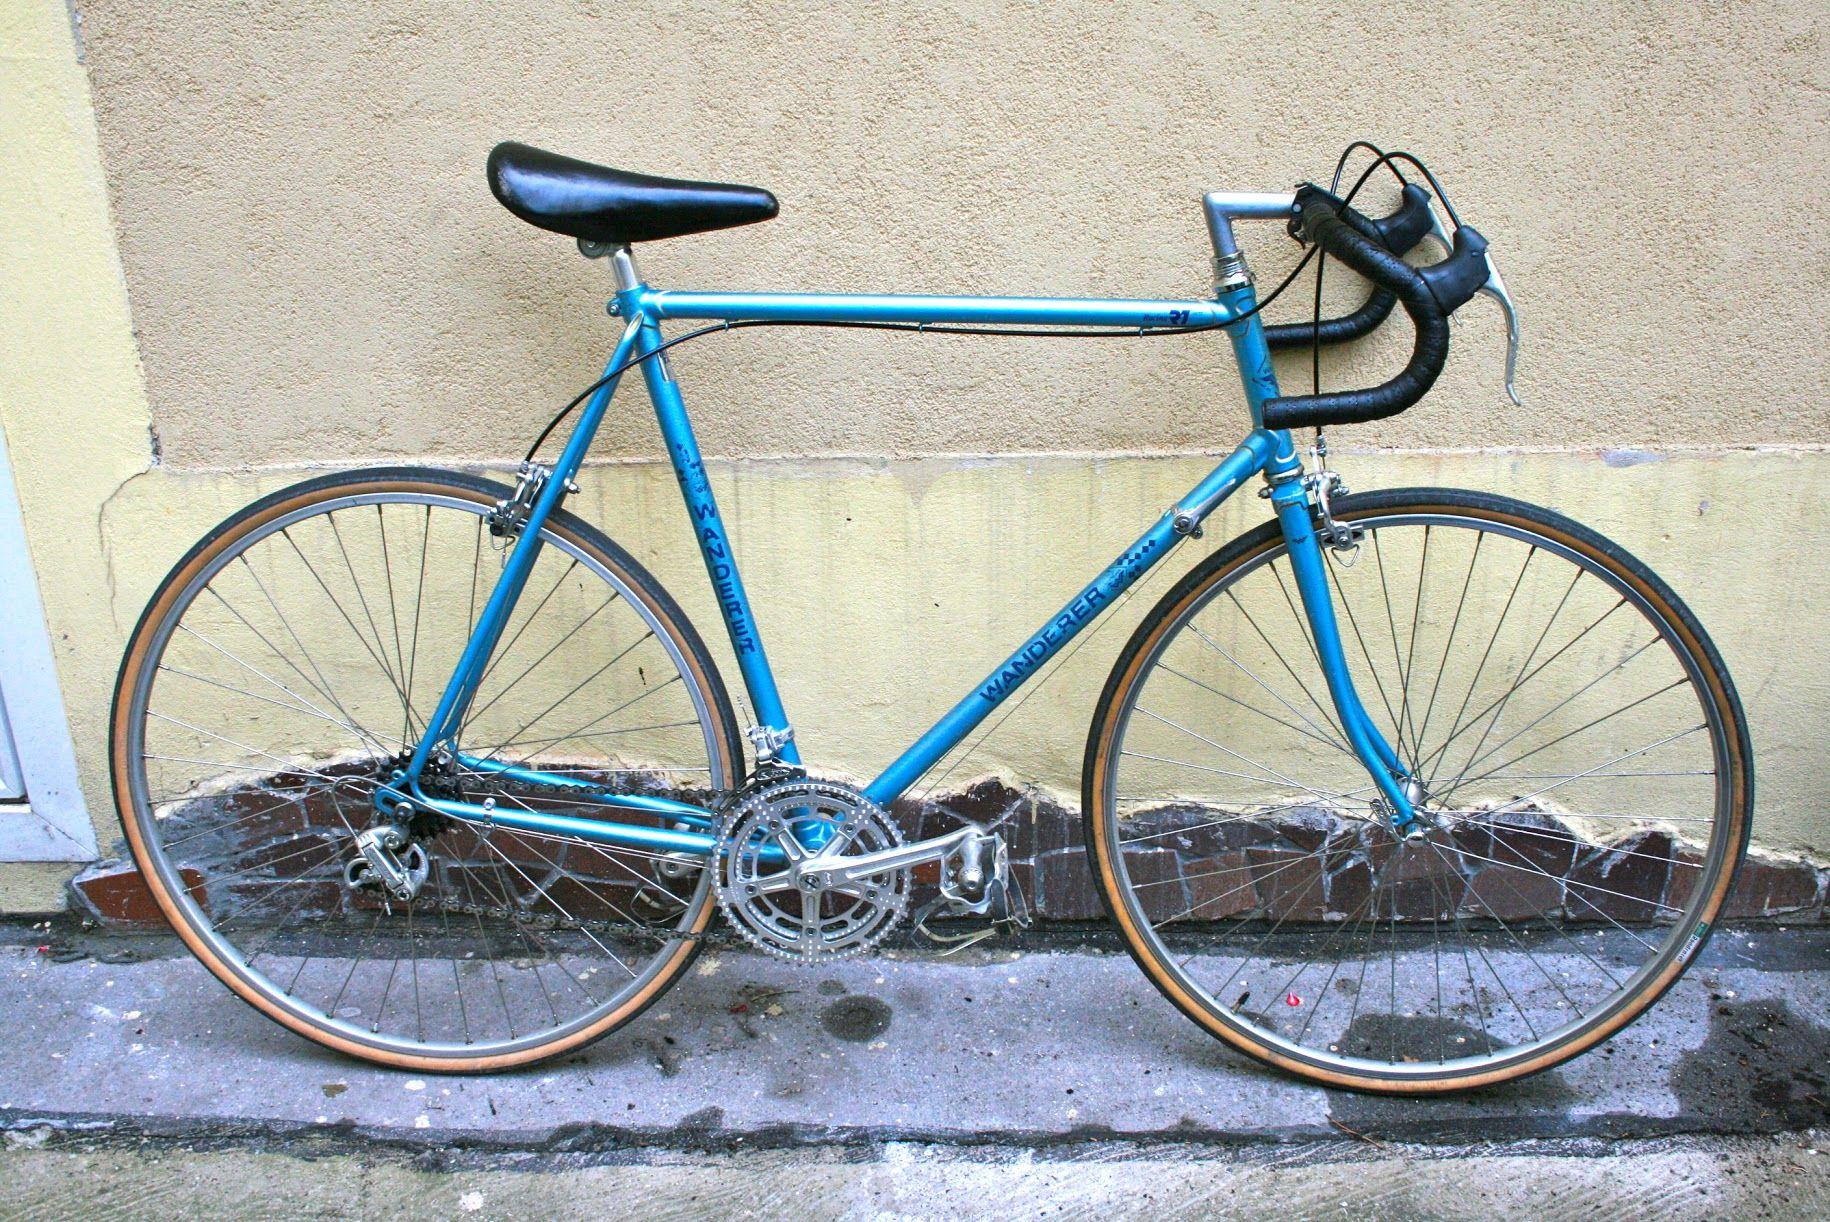 Wanderer 1982 Shimano 600 Cycling Handmade Steel Vintage Frame Bike Ride Wanderer Shimano Bicycle Vintage Bicycles Bike